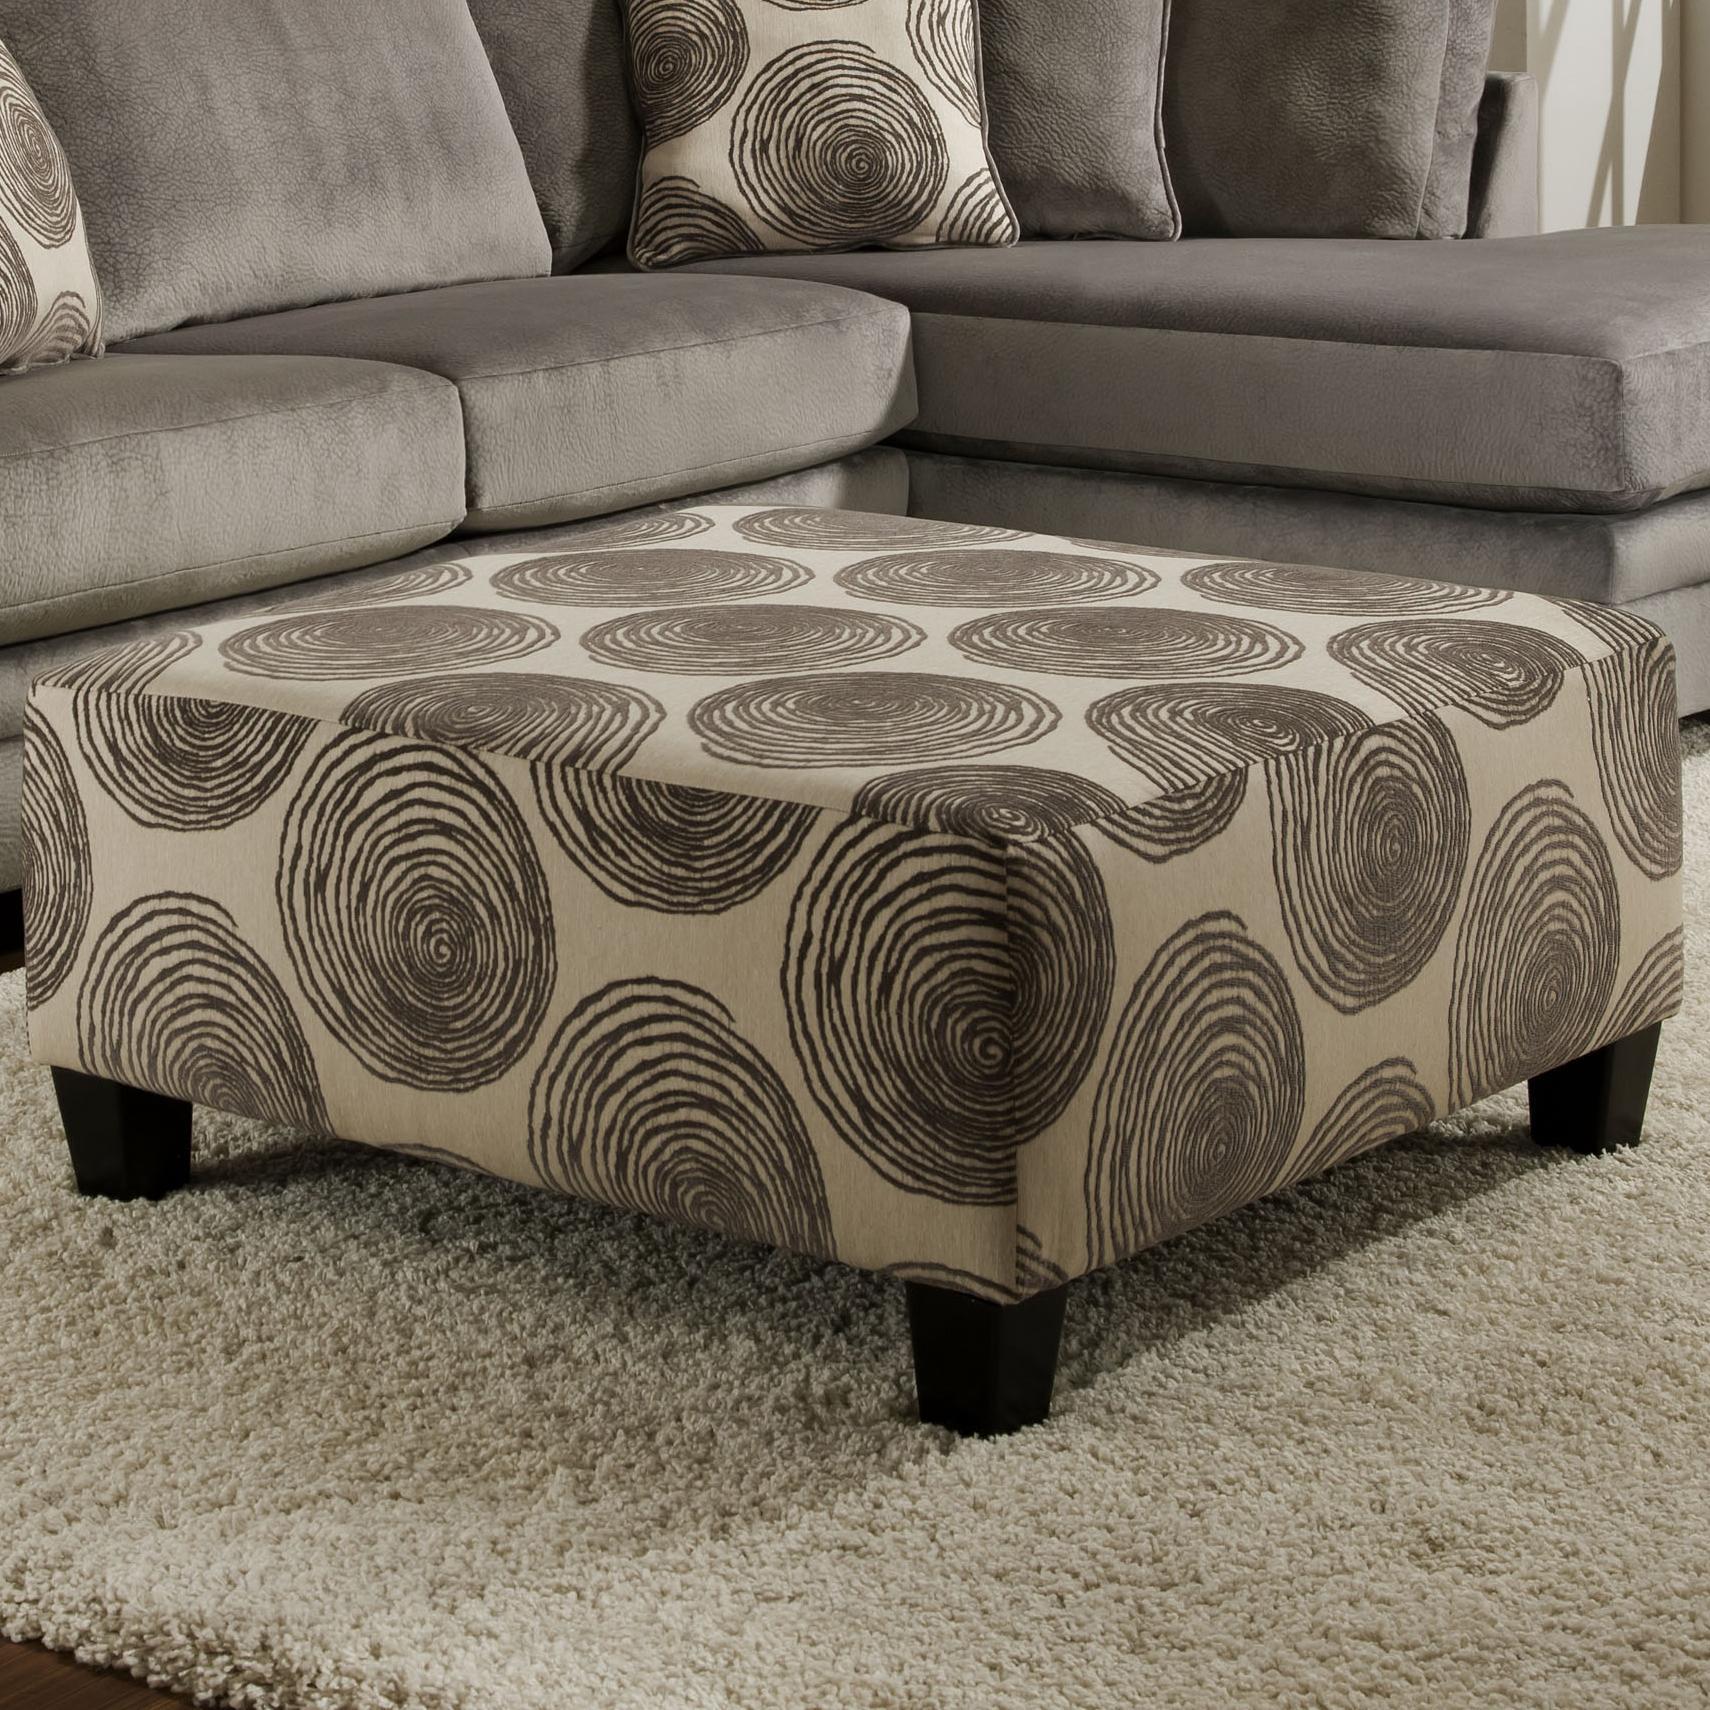 8642 Ottoman by Albany at A1 Furniture & Mattress